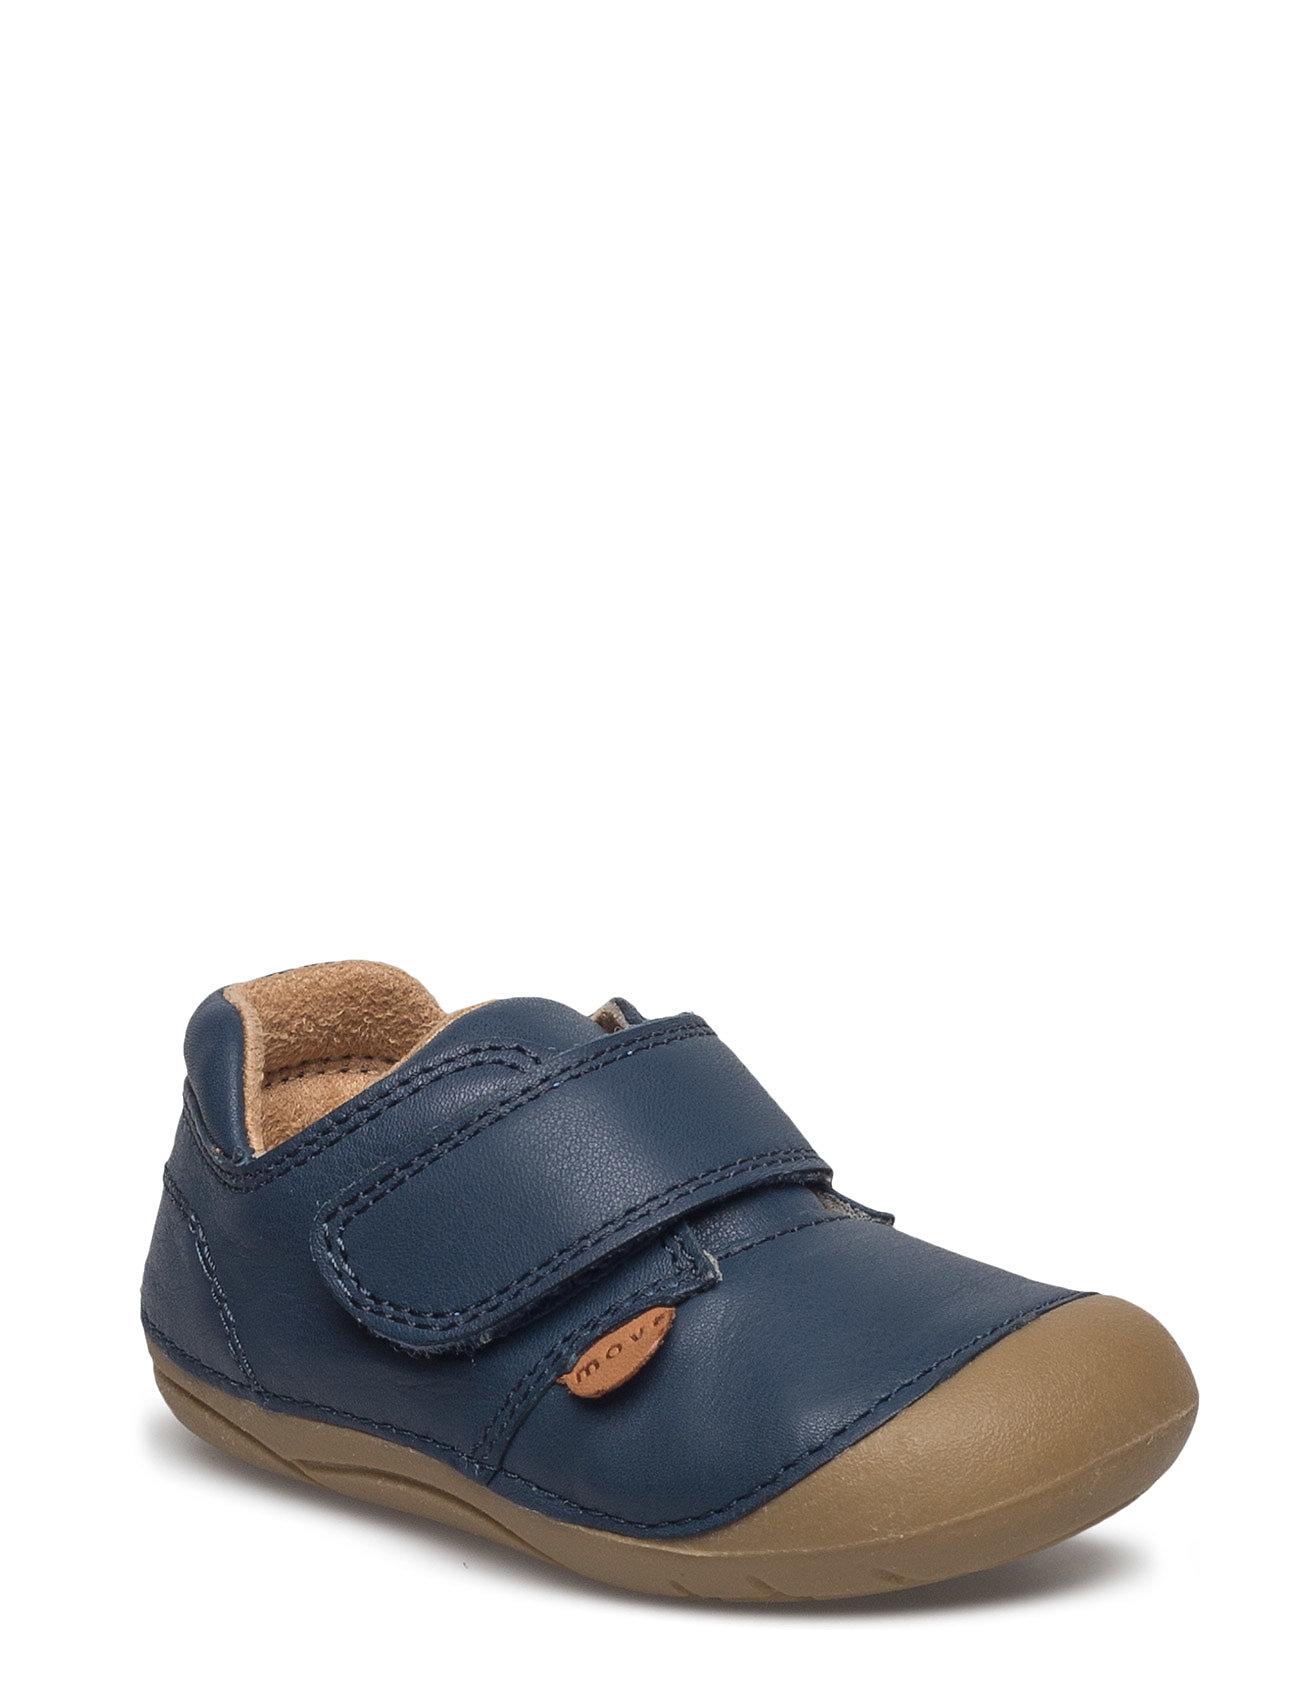 ea3032a9502 Sort Move by Melton Flex Walker - Velcro Shoe sko for børn - Pashion.dk